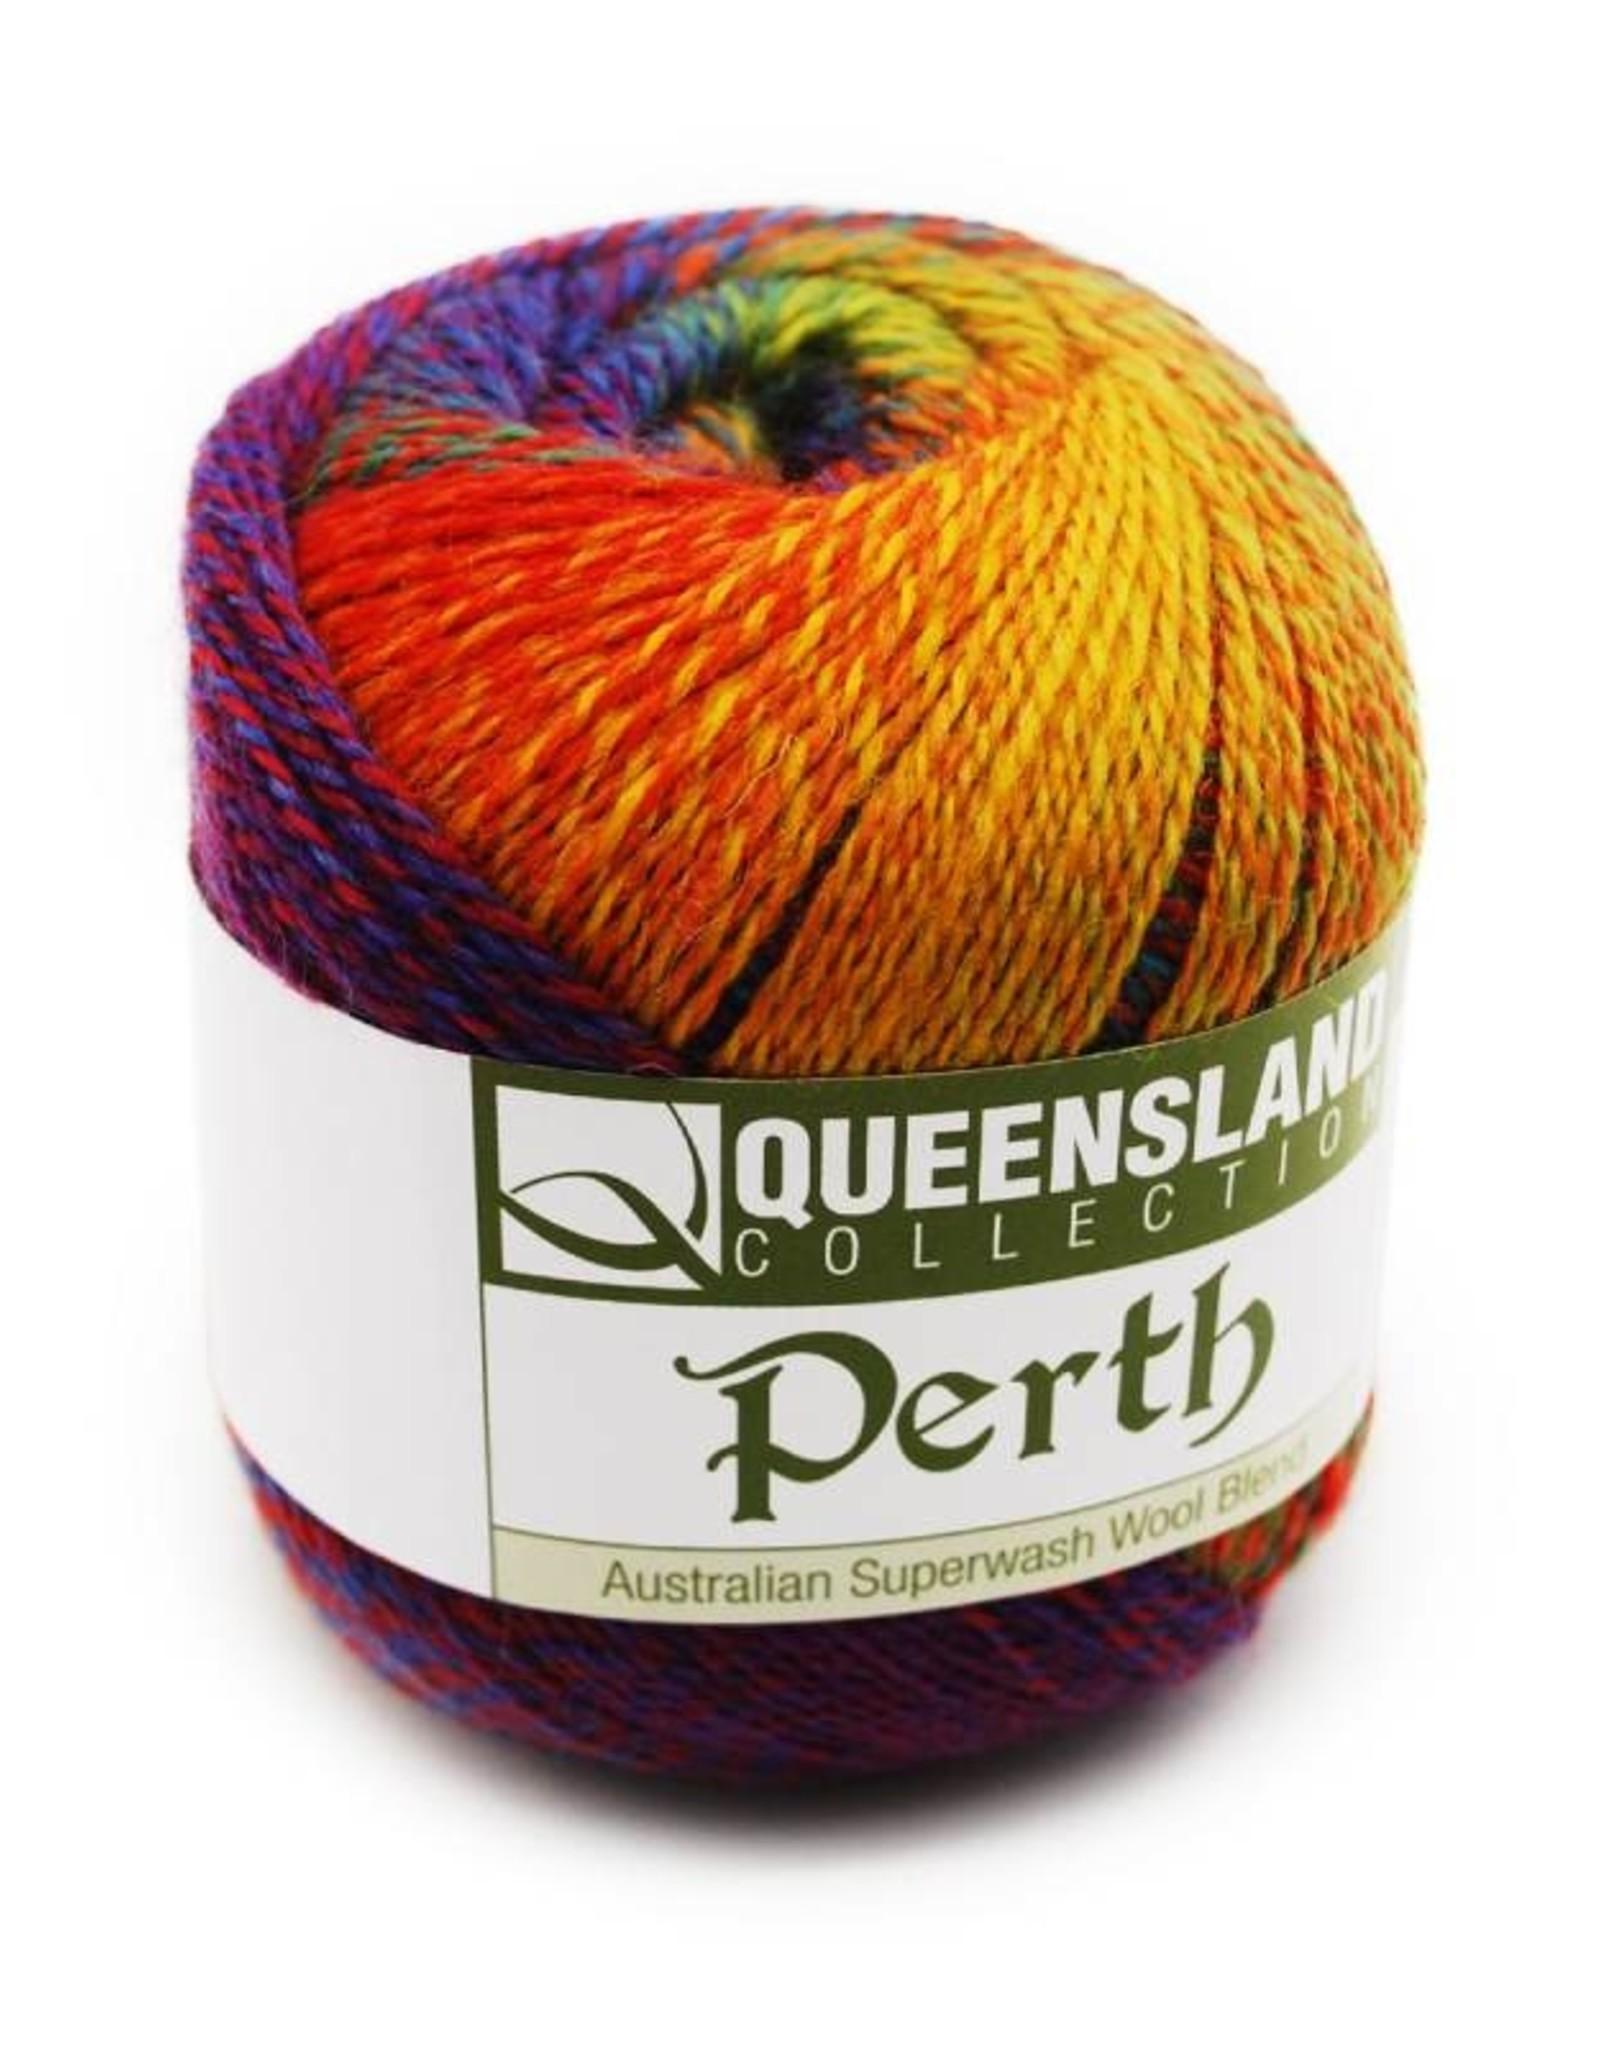 Queensland Perth